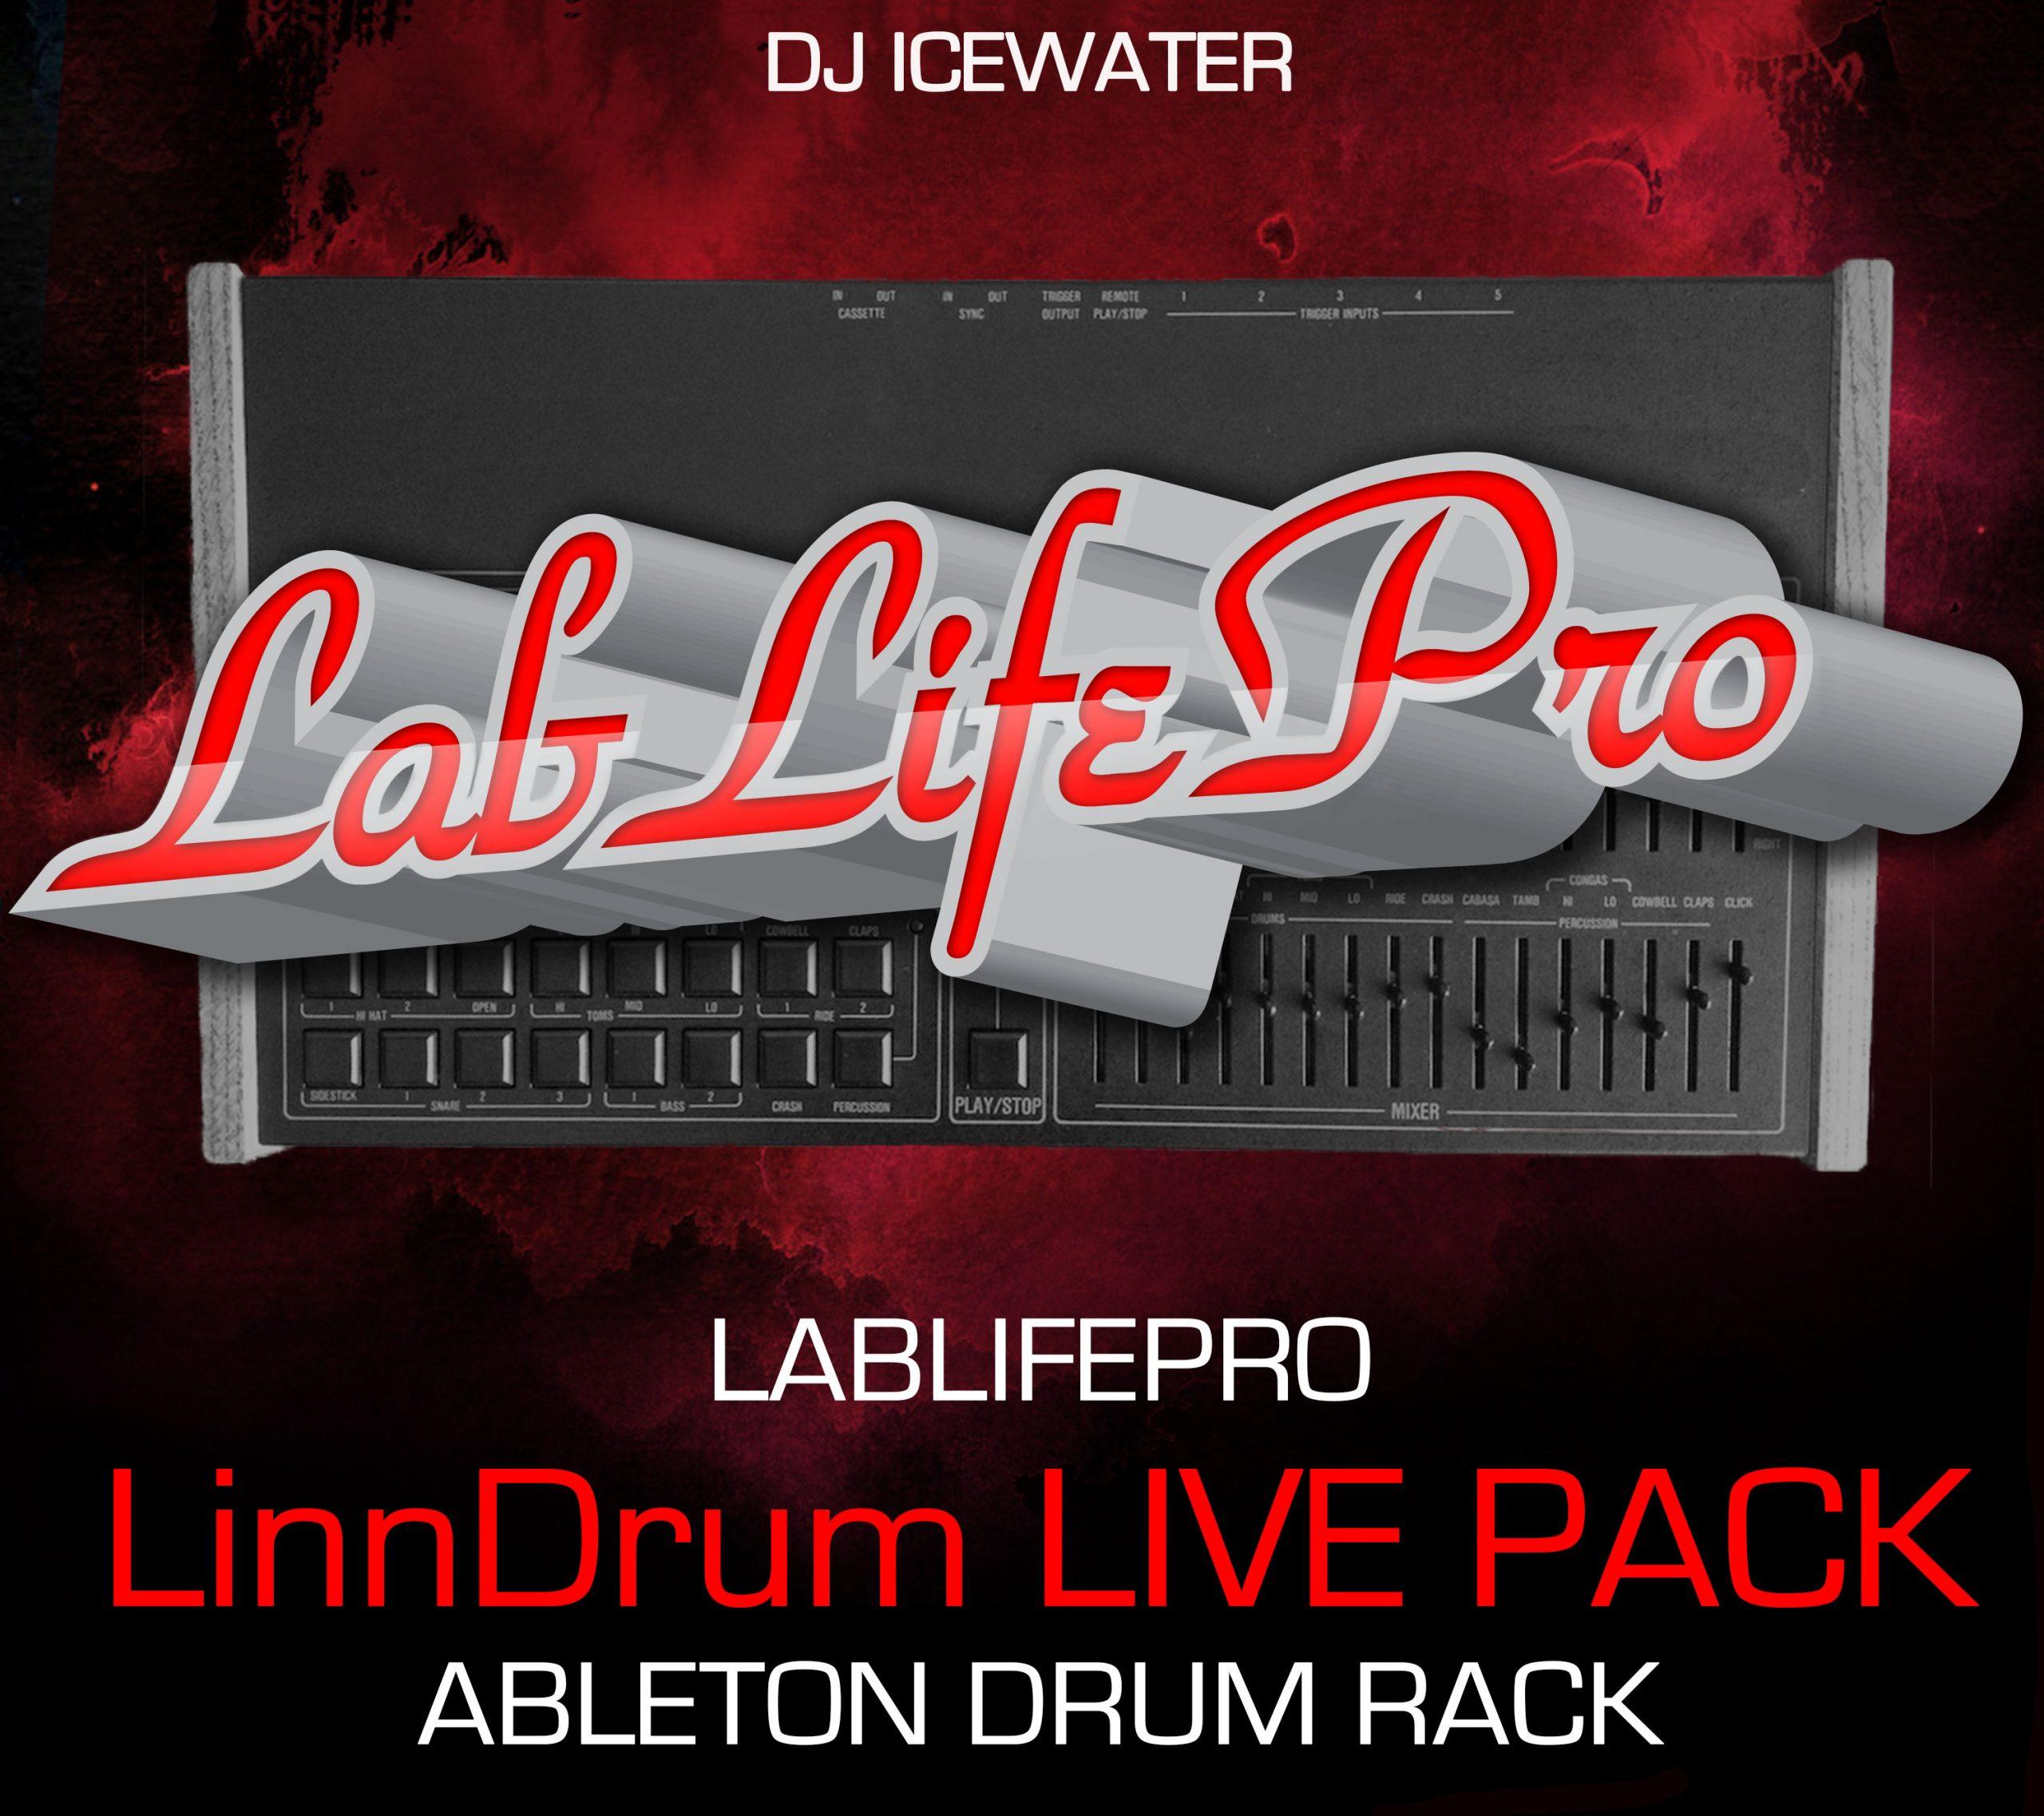 LinnDrum-Live-DRUM-PACK